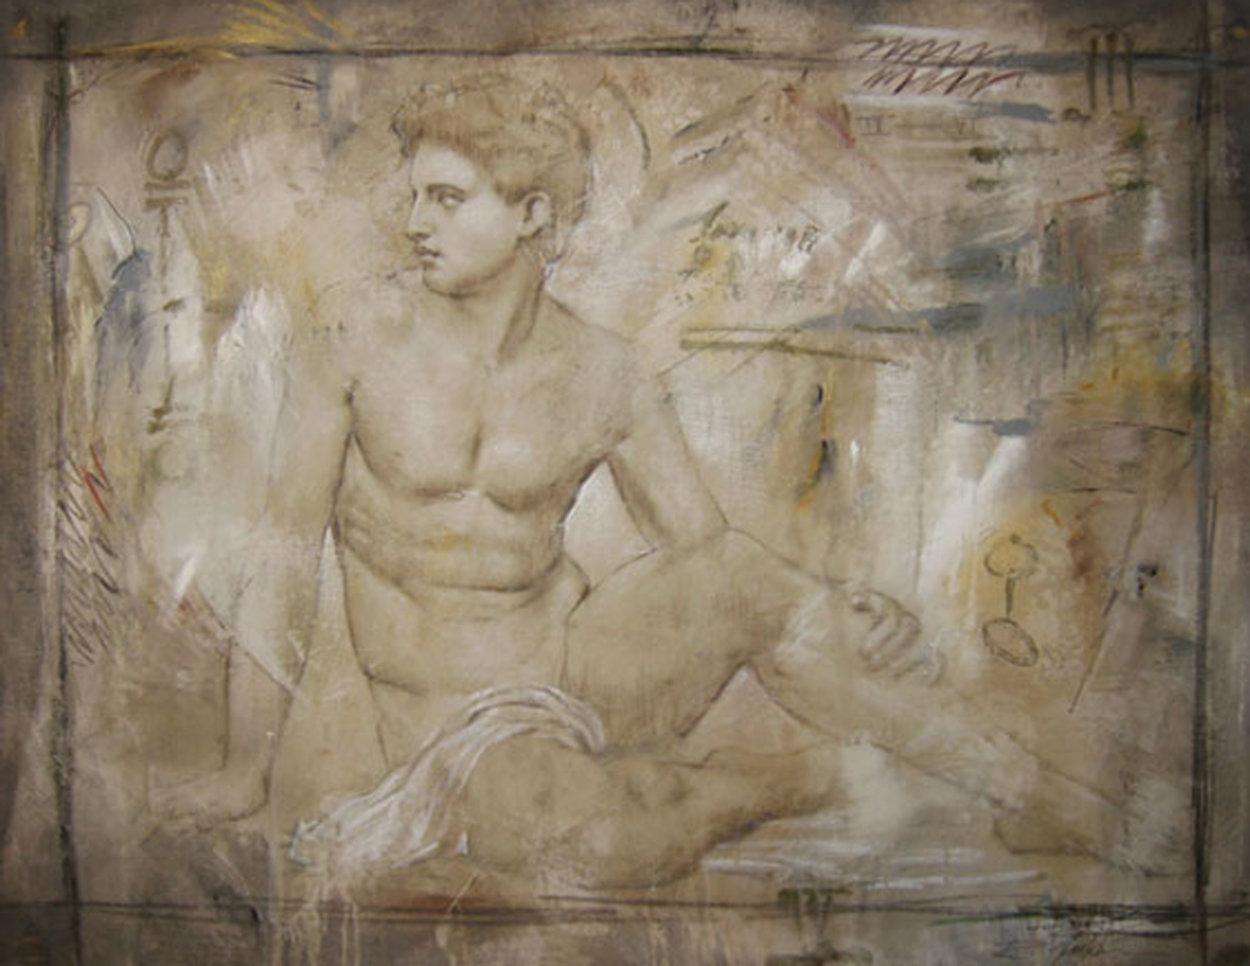 Untitled Grecian Man 36x44 Super Huge Original Painting by Richard Franklin